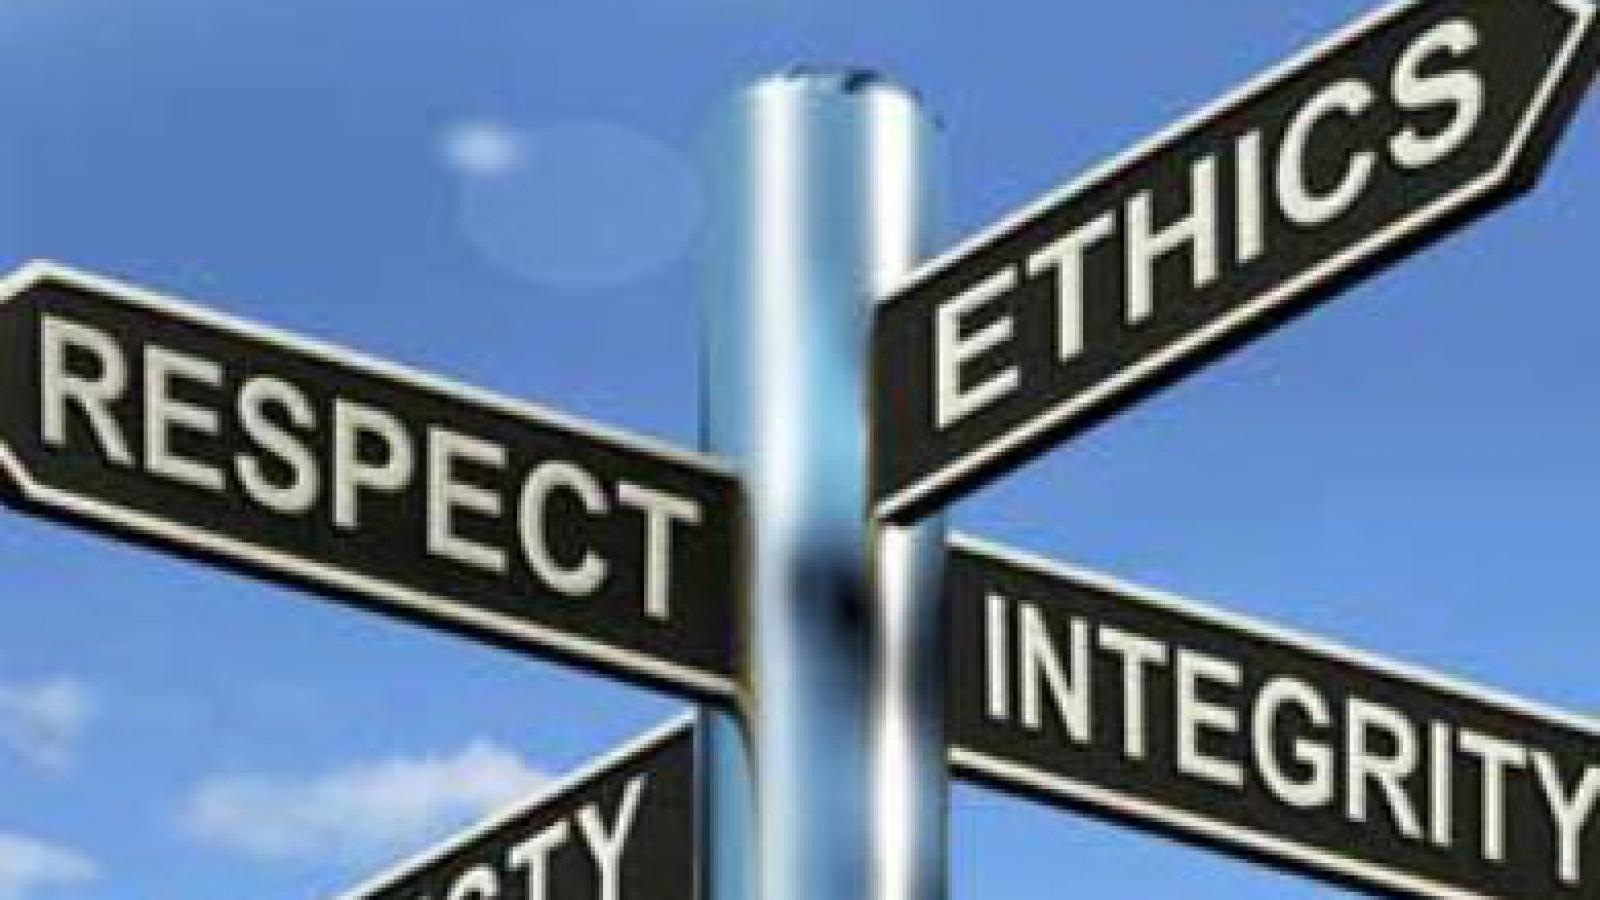 Proetic Etic Transparen Integritate Corup Ie